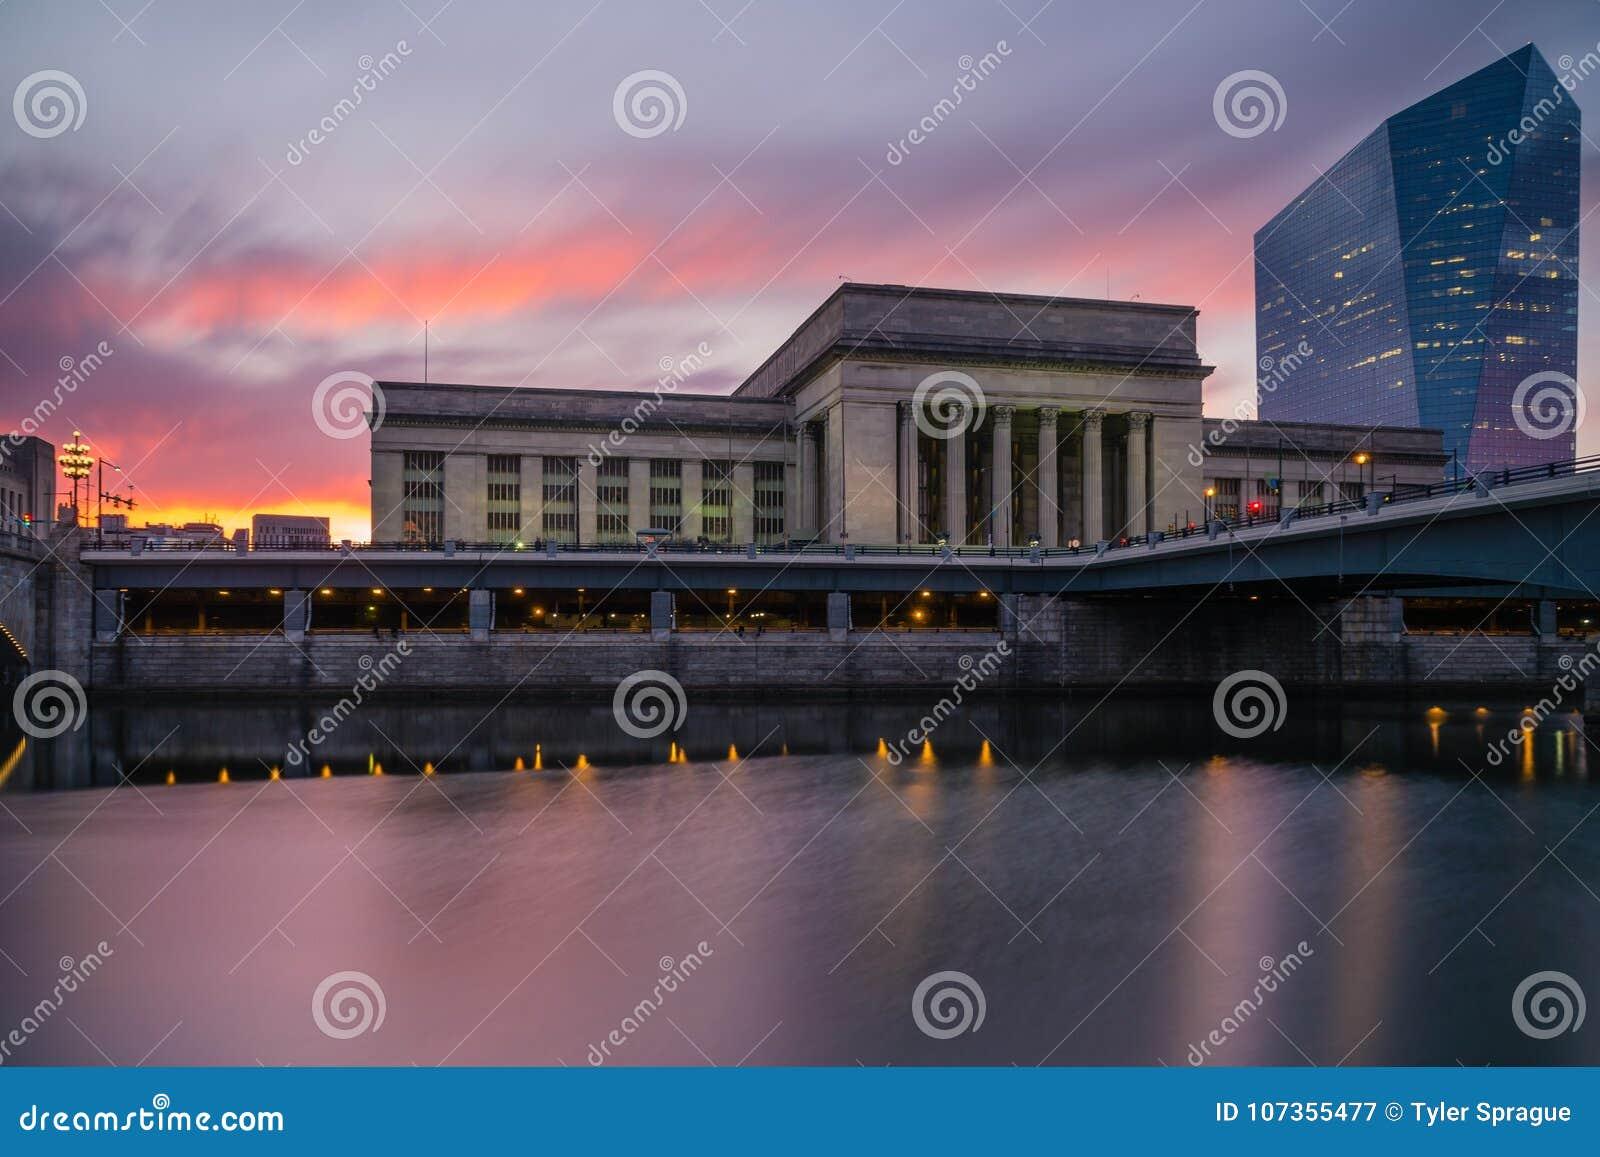 Train Station Philadelphia